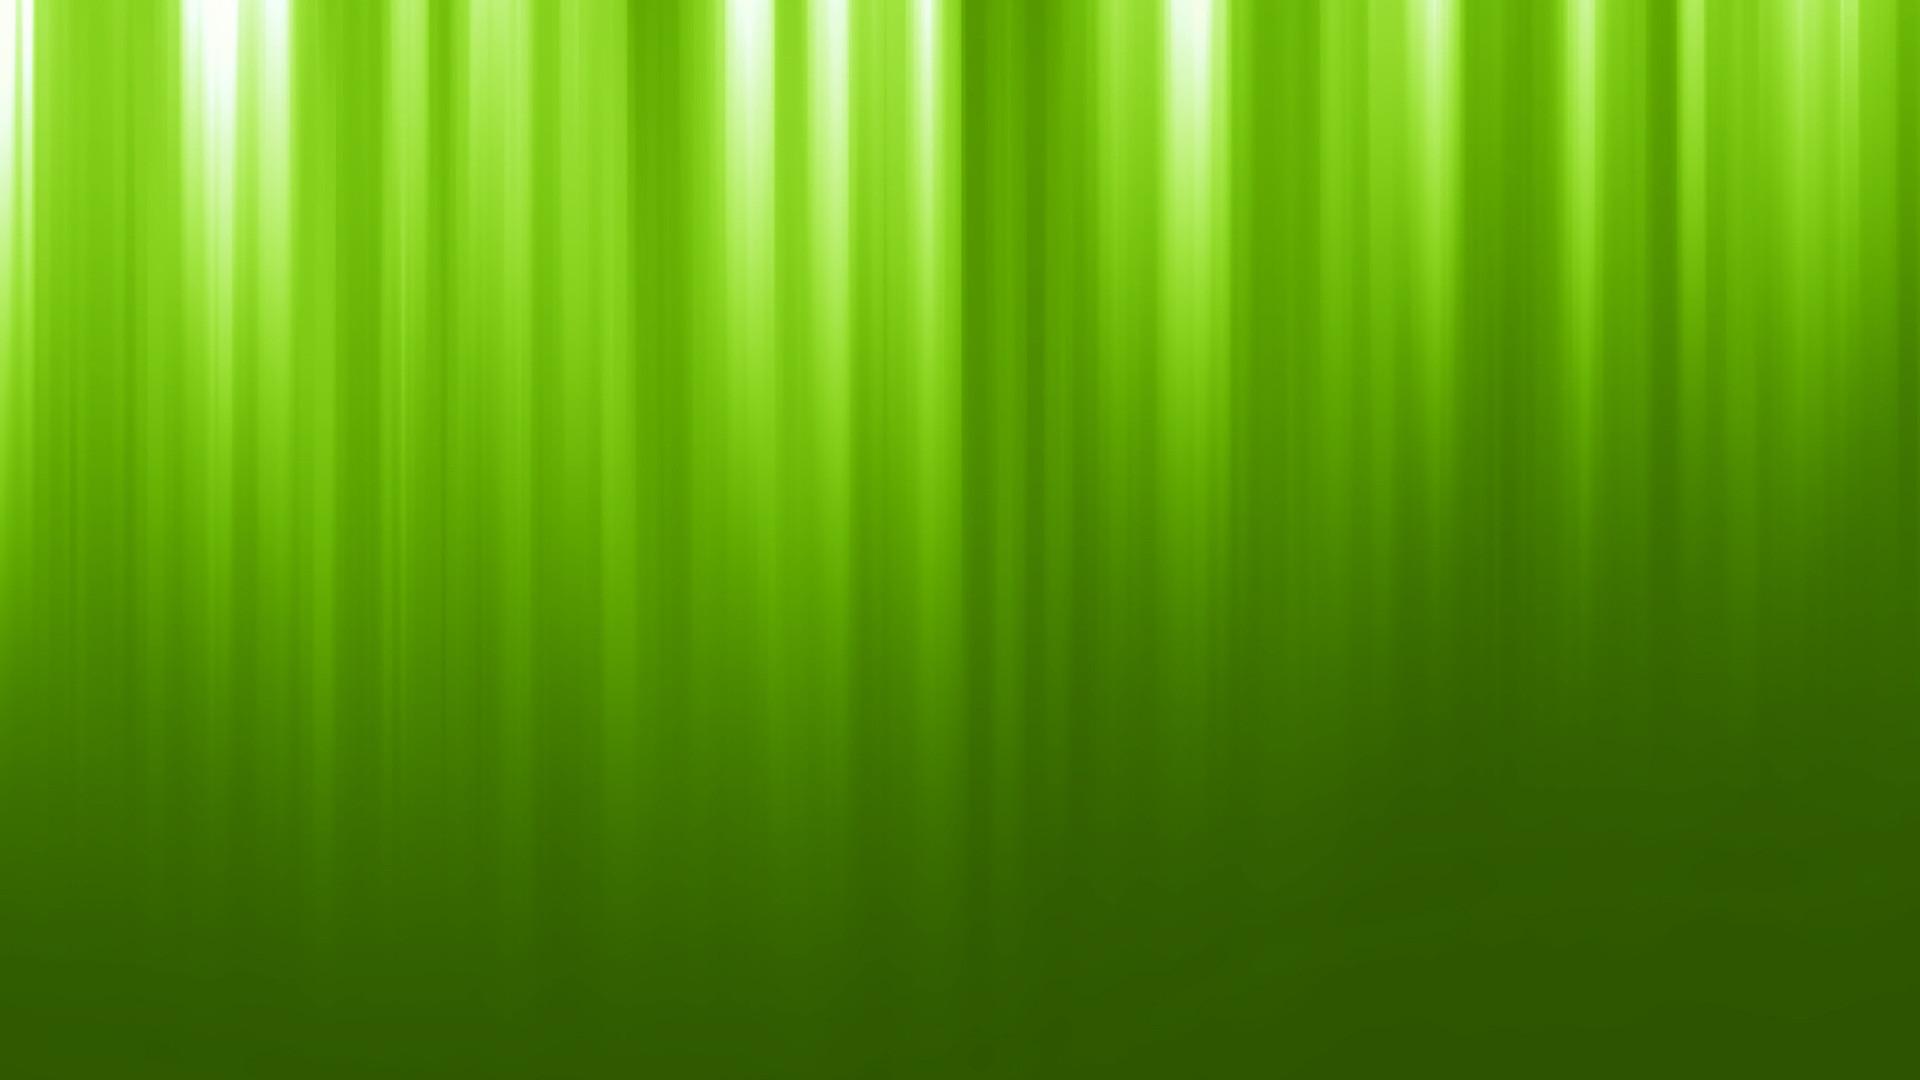 Green-Wallpaper-2.jpg. Original Resolution px